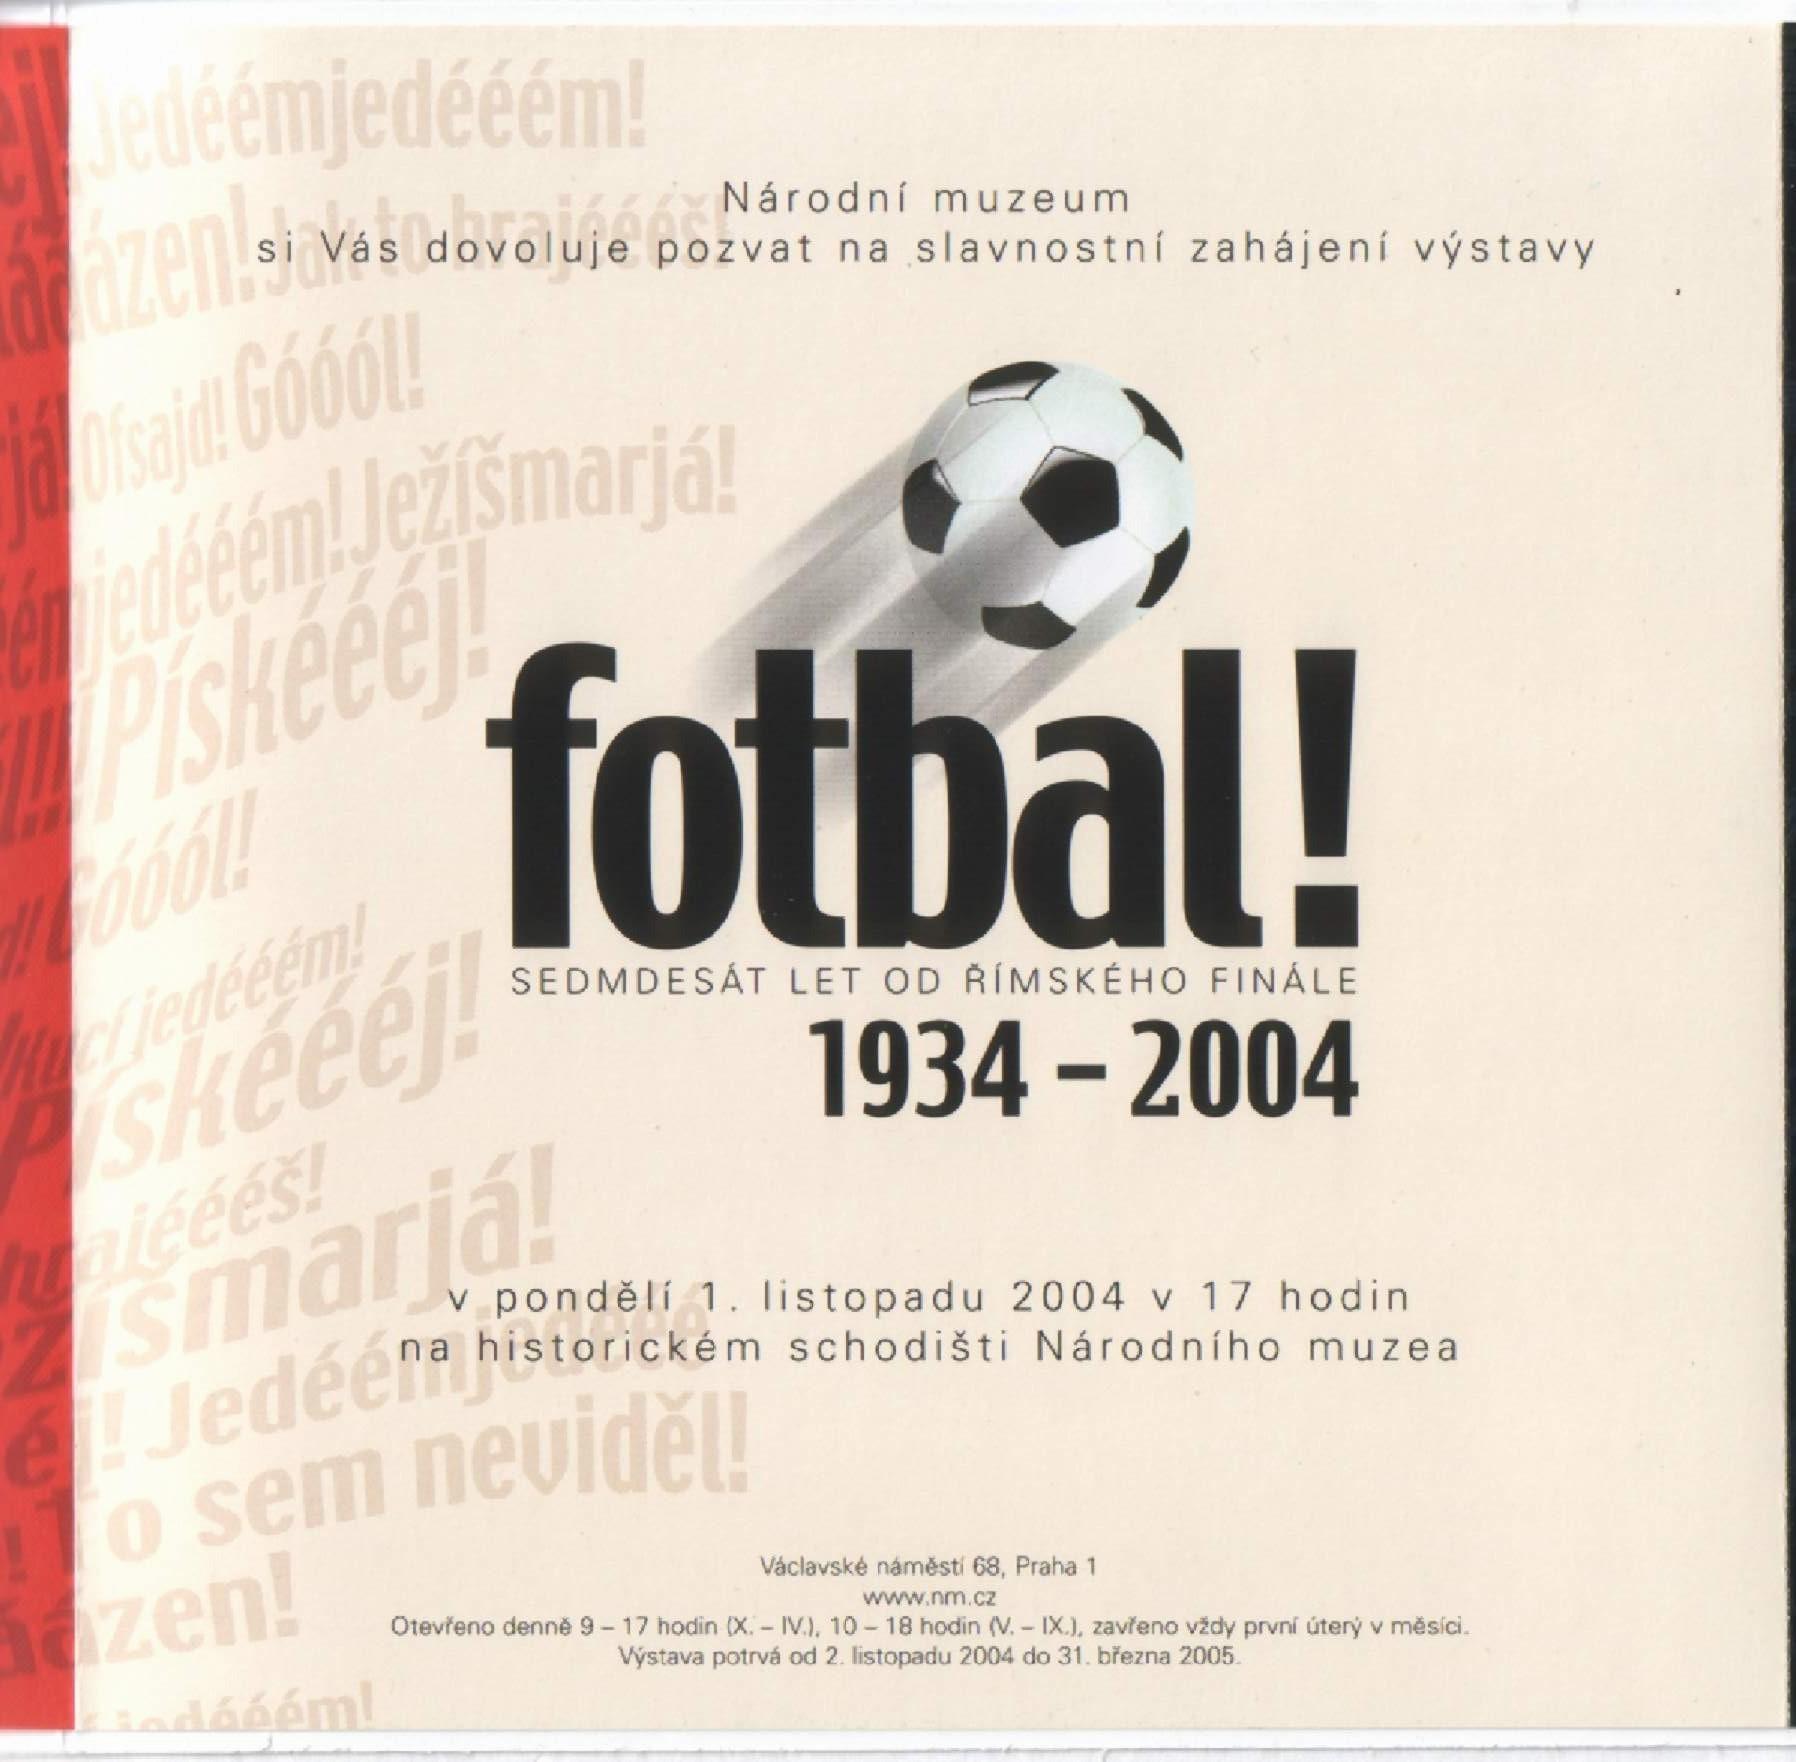 Fotbal od roku 1934 - 2004